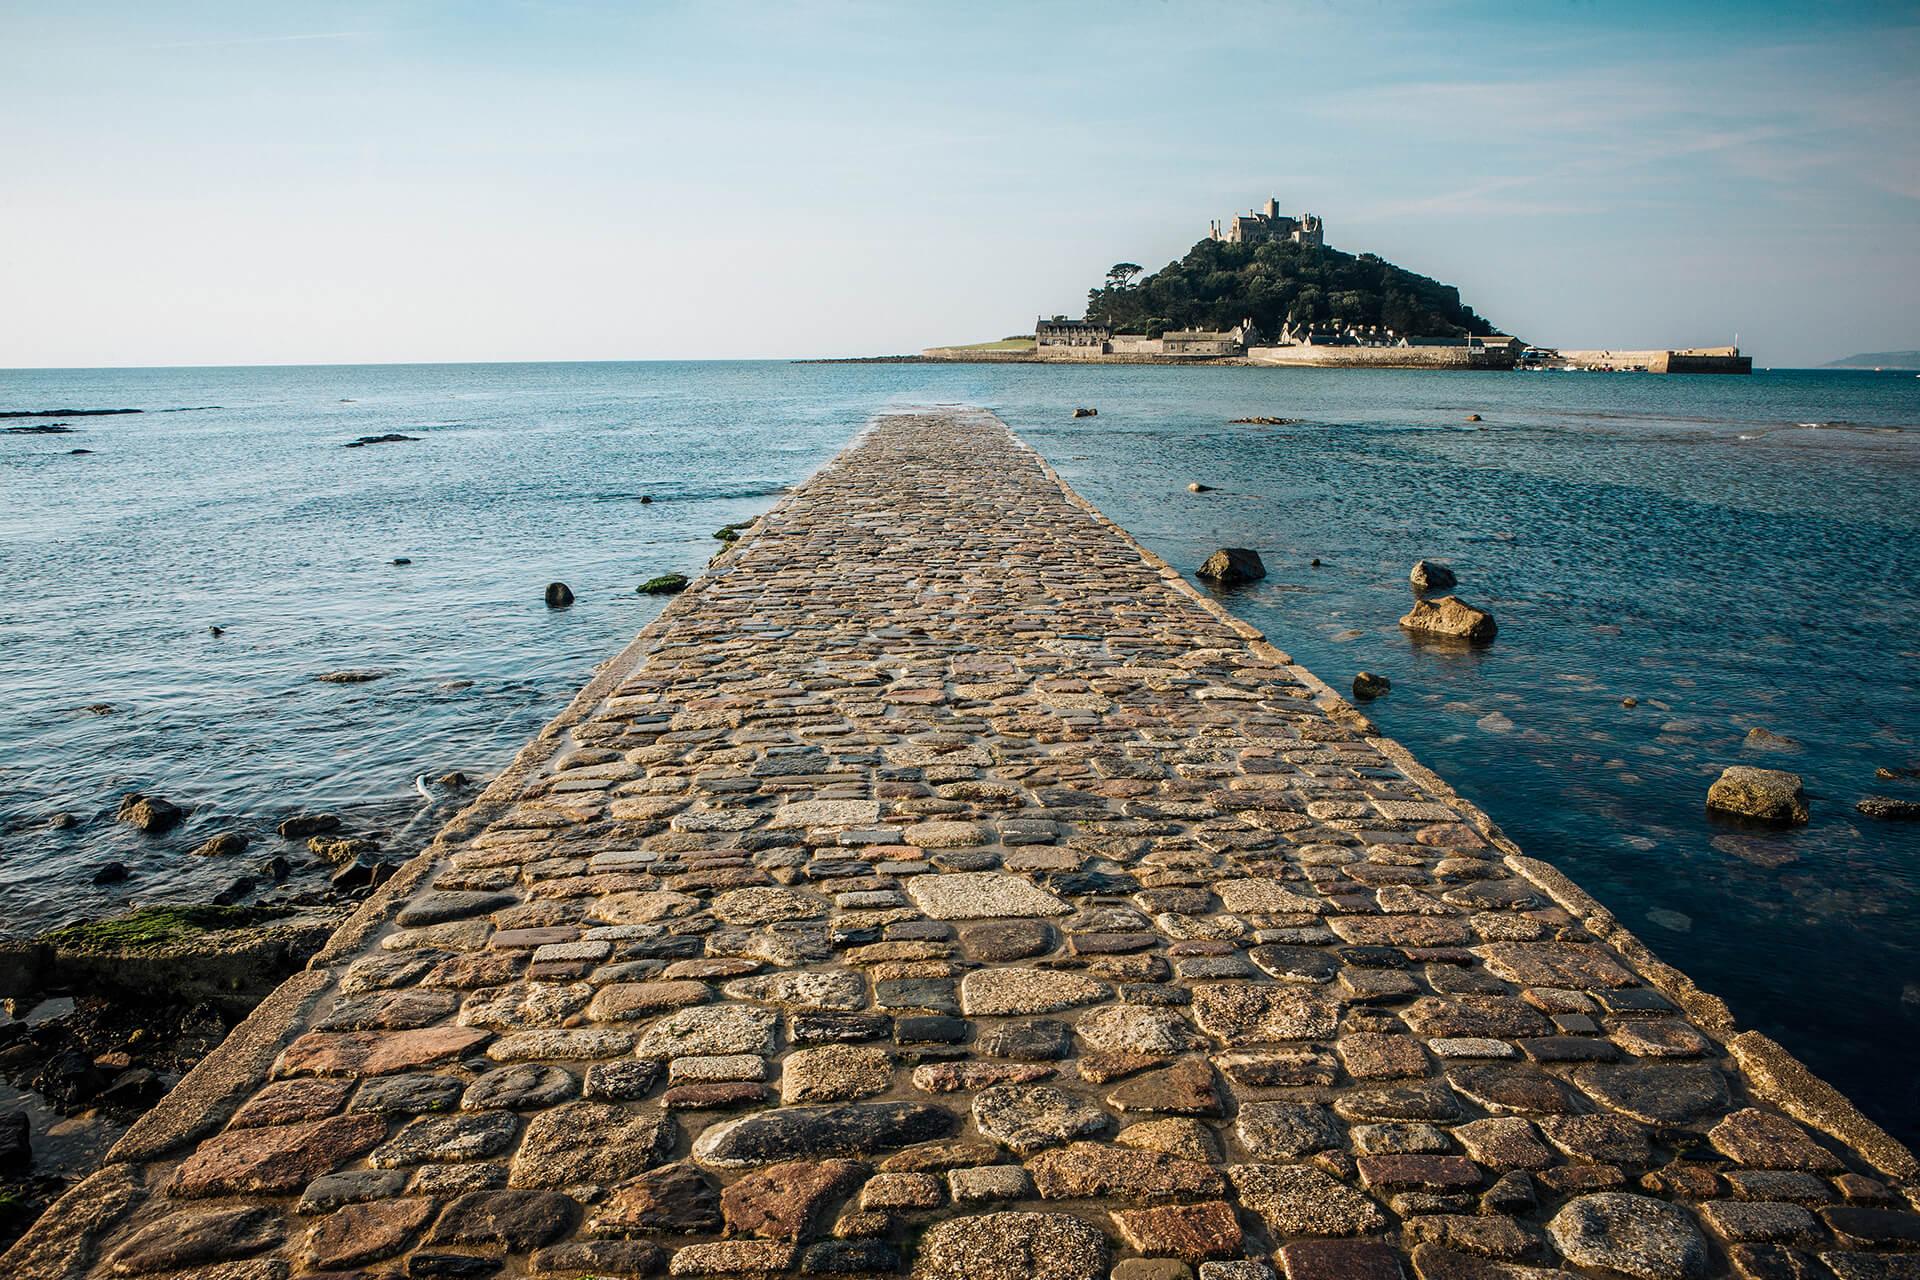 Wild Britain, Barbour, Lake, England, Trees, Rocks, Agency, WeAreShuffle, Sea, Path, Island